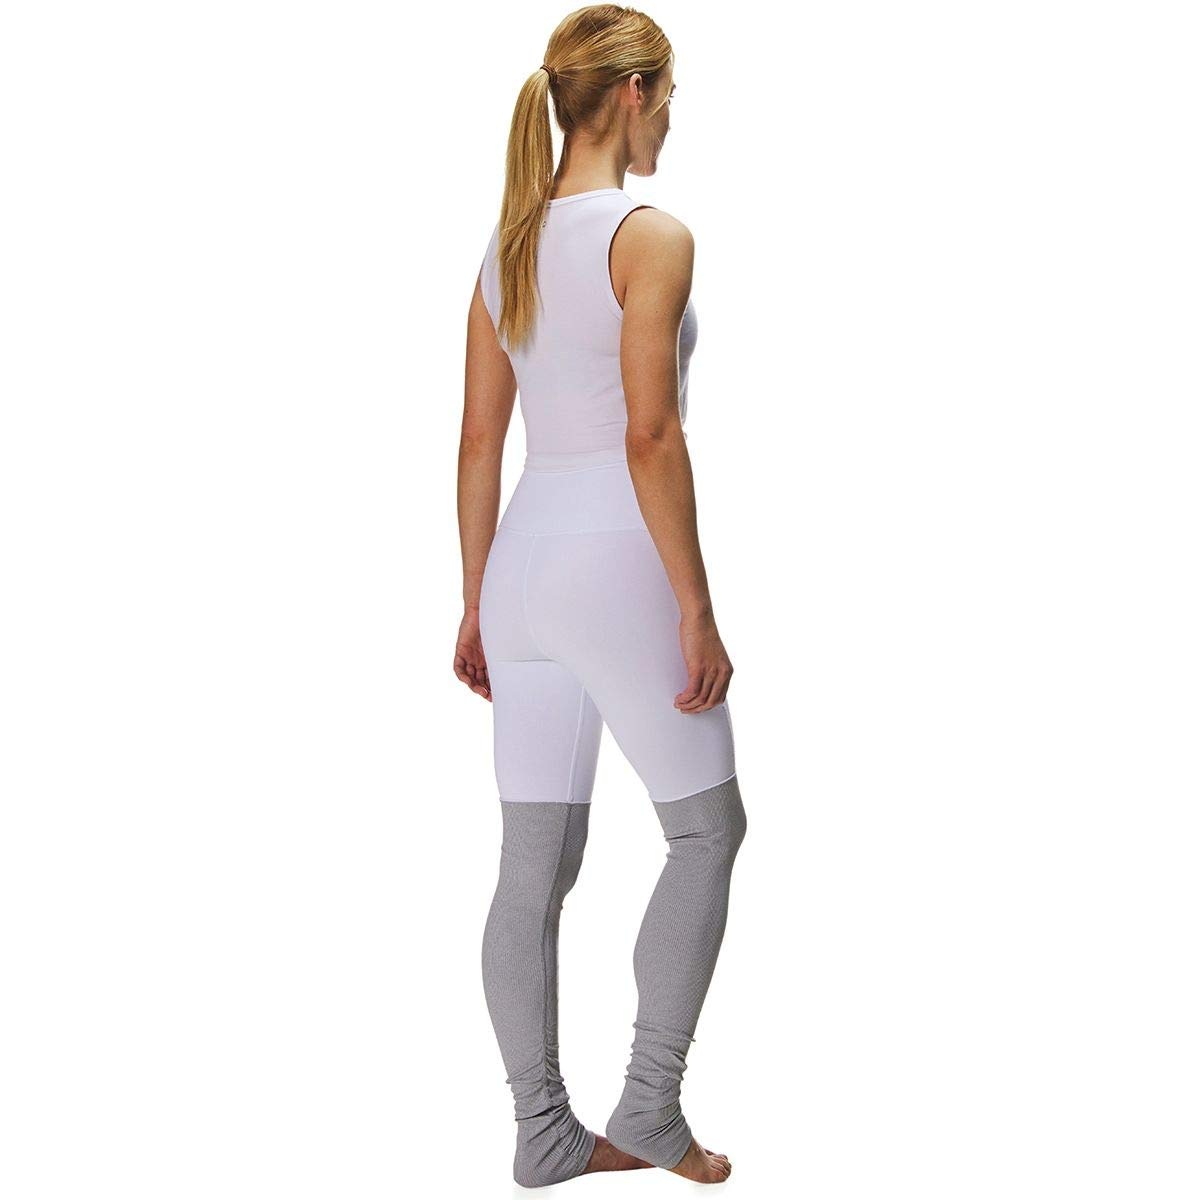 Alo Yoga High-Waist Goddess Legging - Women's White/Dove Grey Heather, XS by Alo Yoga (Image #2)